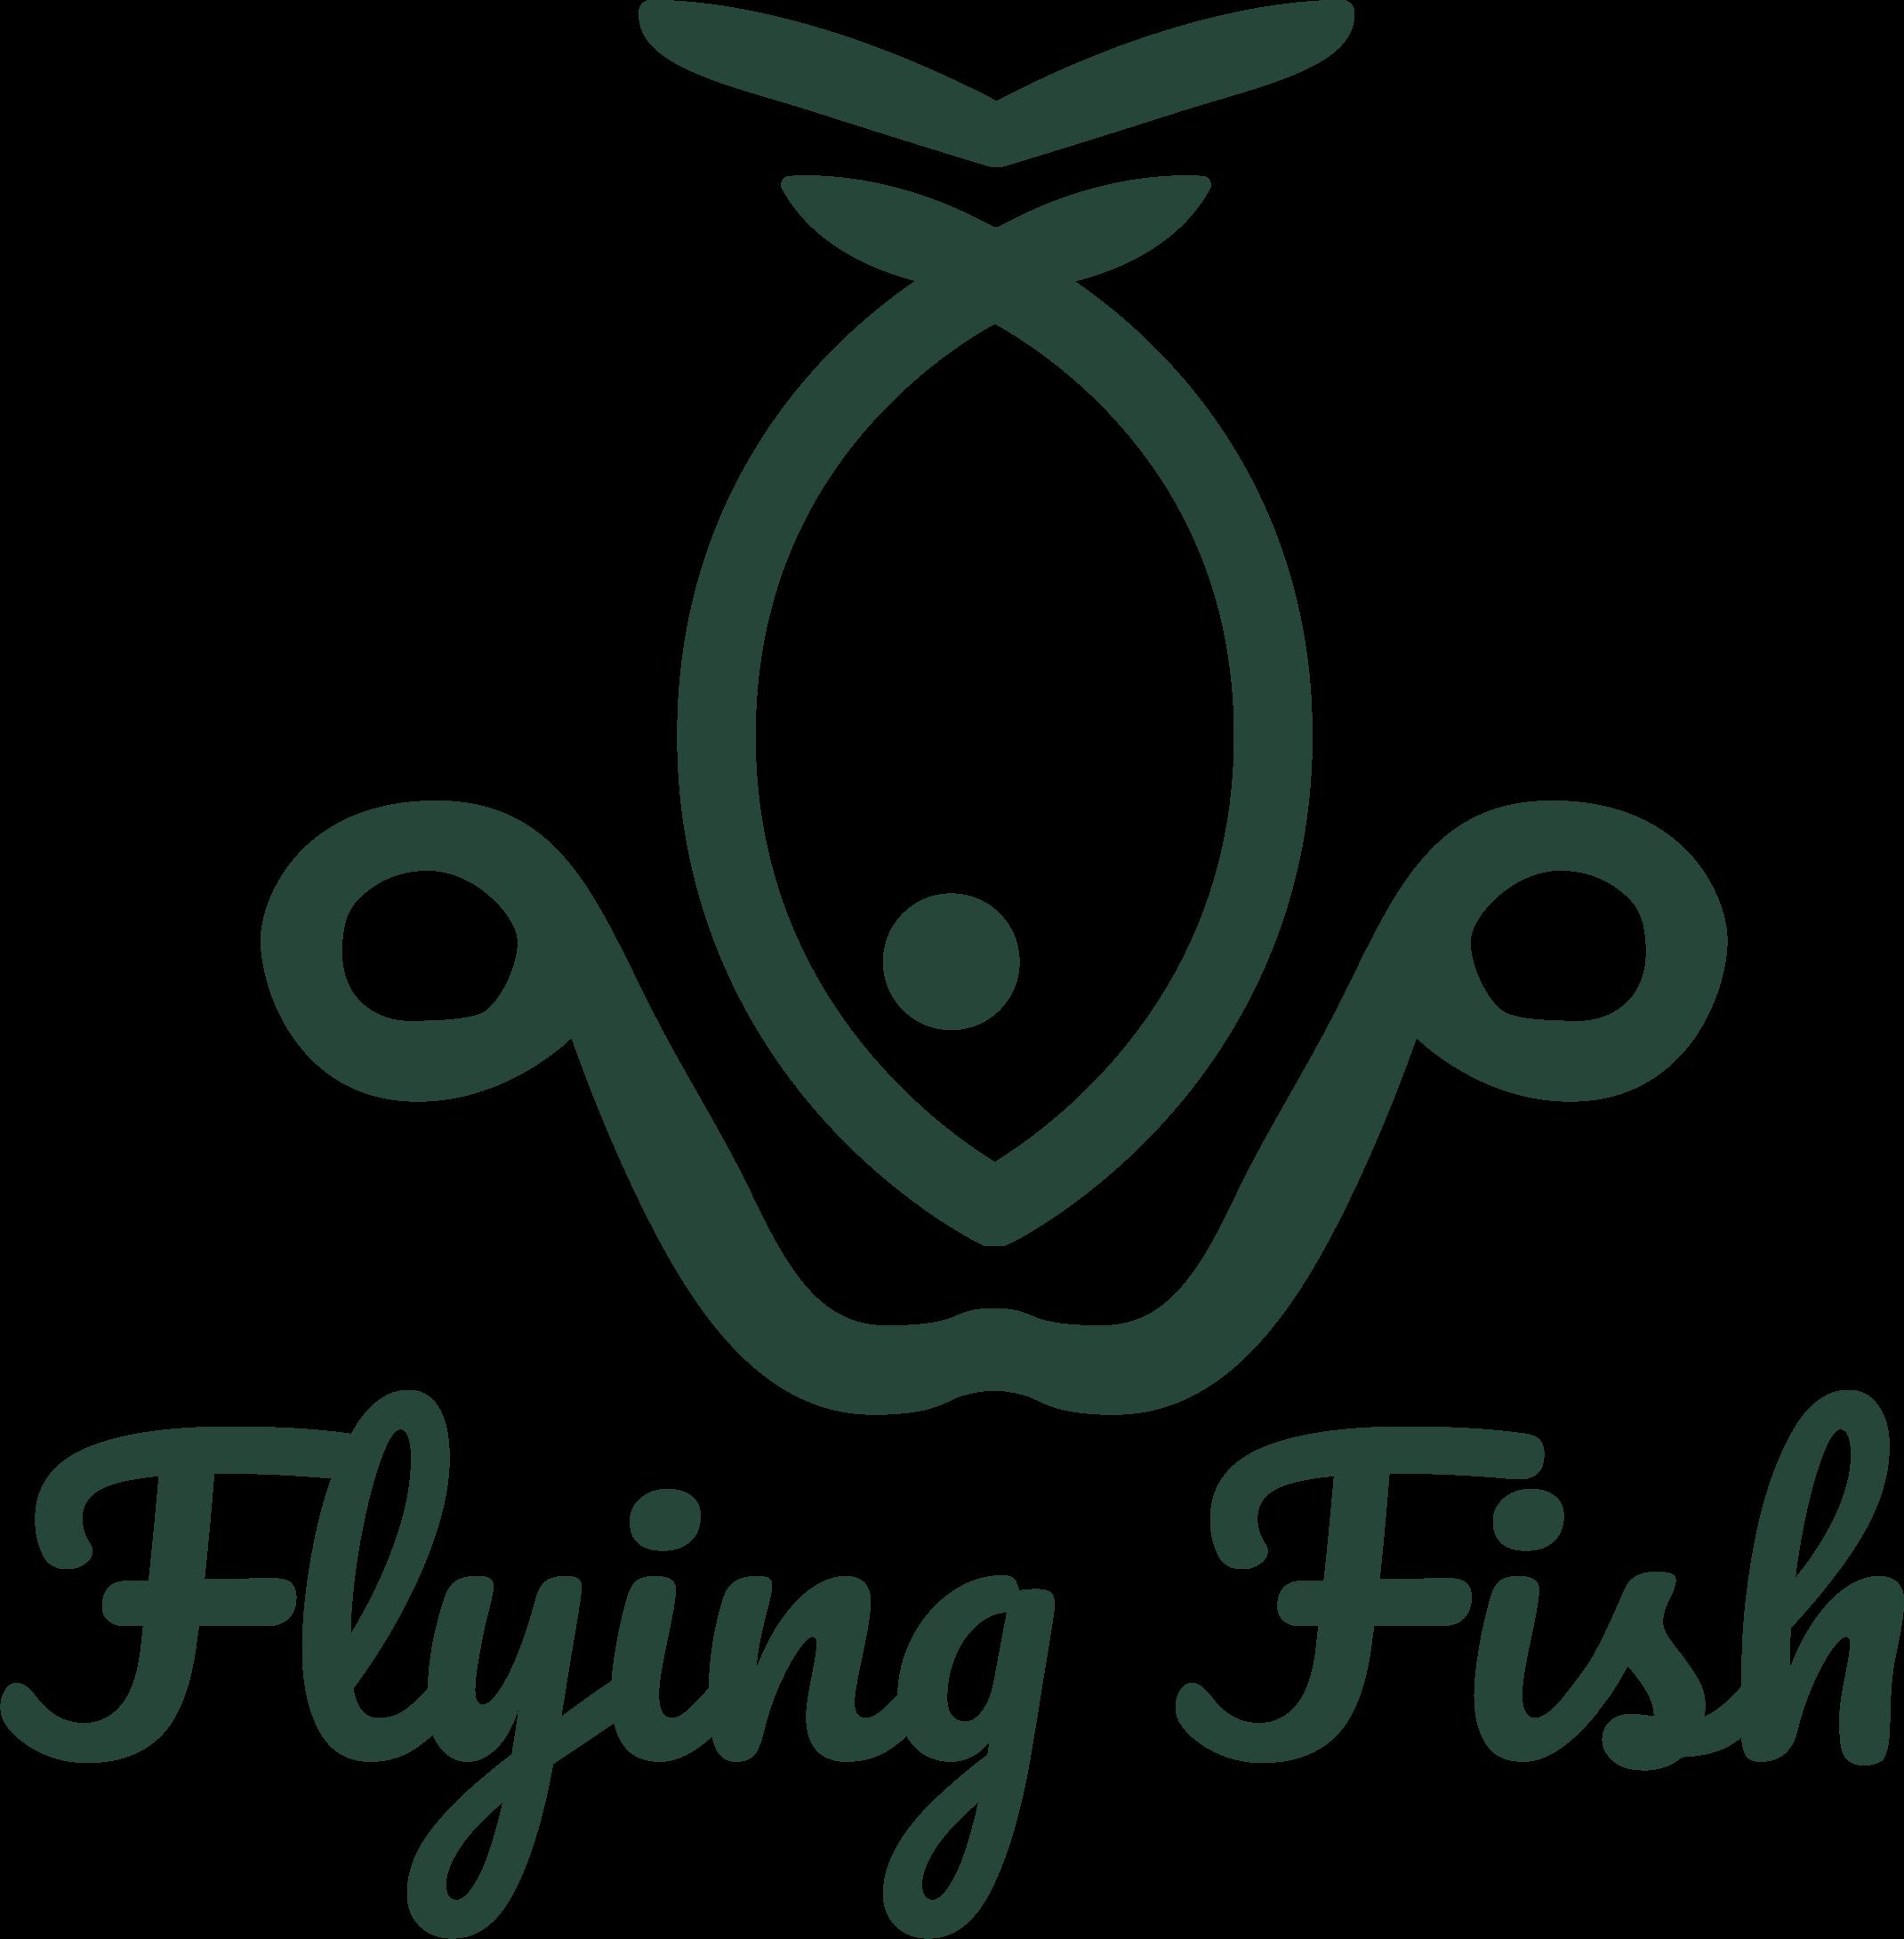 Flying Fish Foils